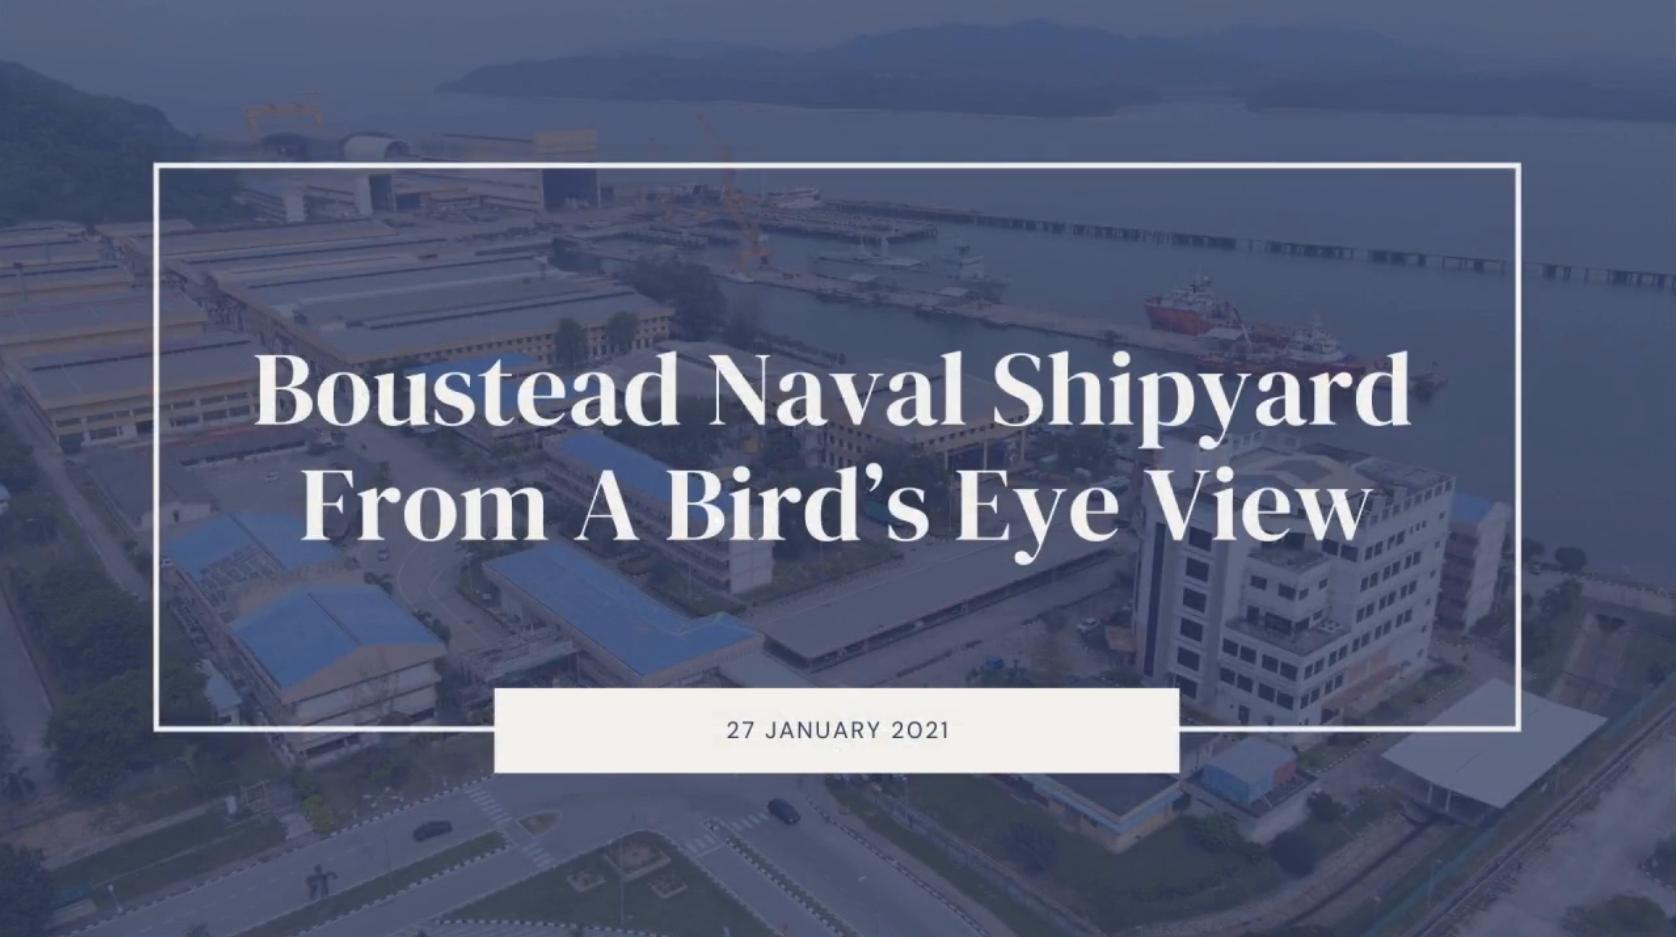 Boustead Naval Shipyard From A Bird's Eye View